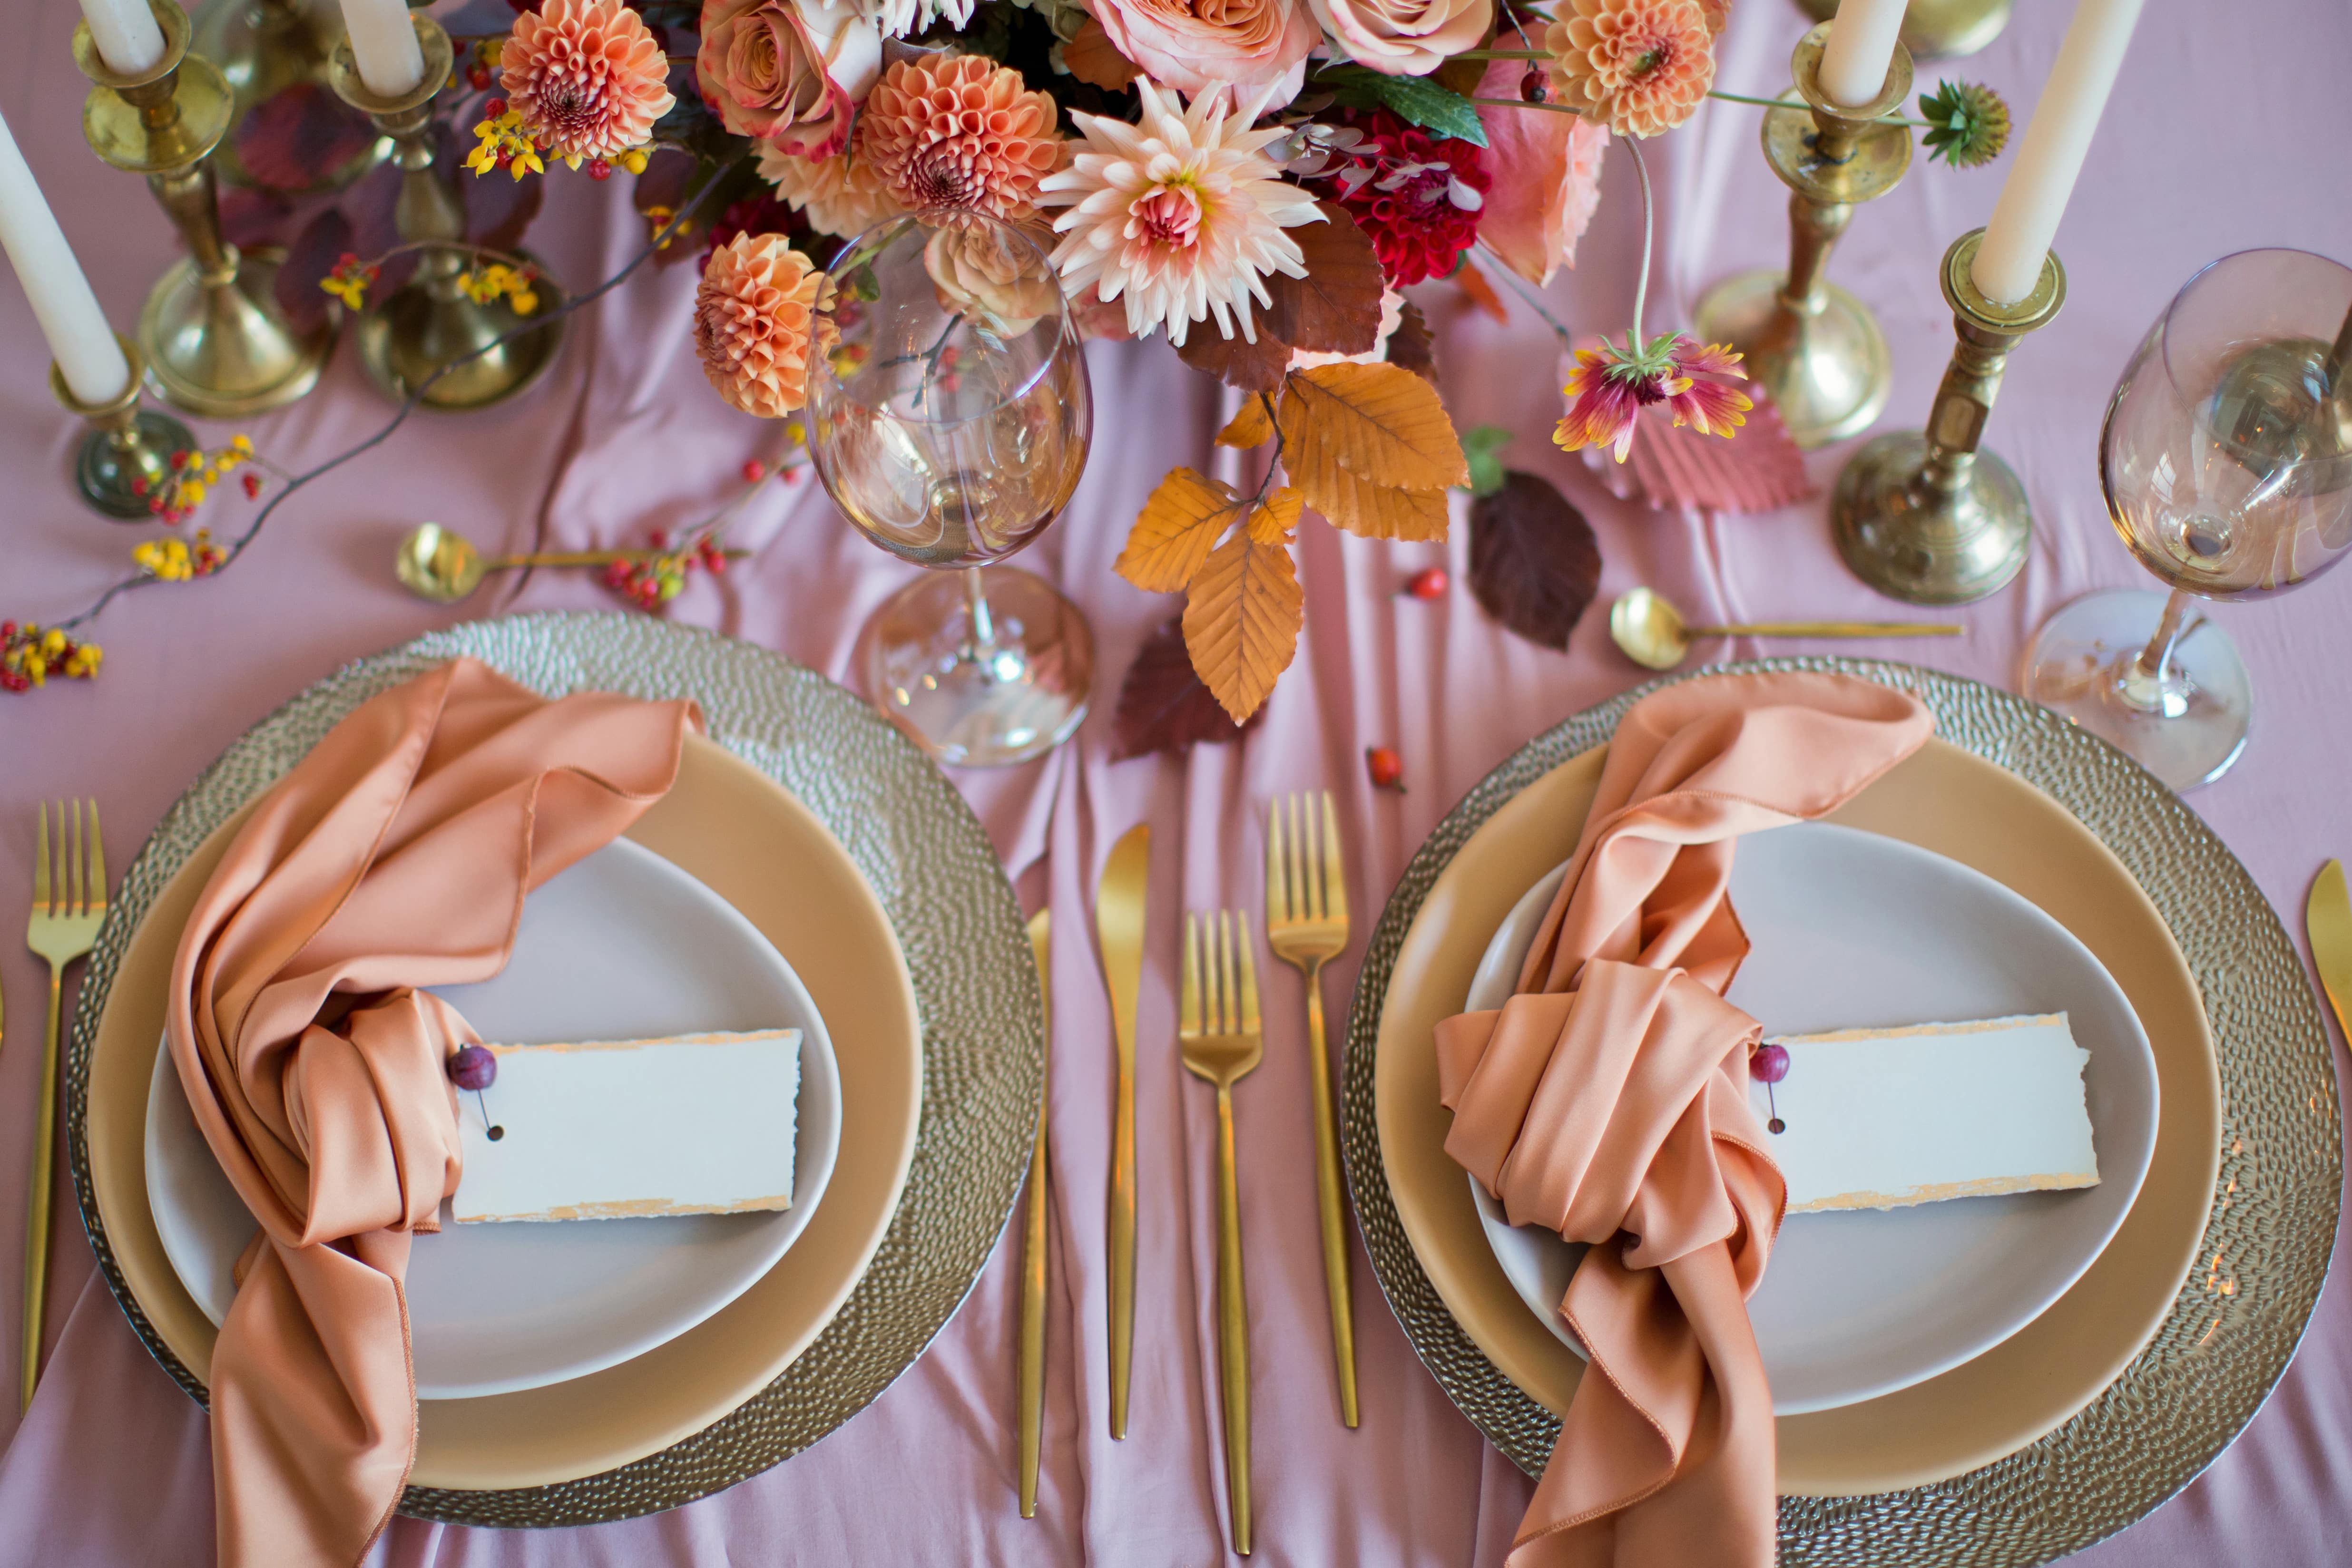 8 Splendid Tips for Planning a Beautiful Fall Wedding